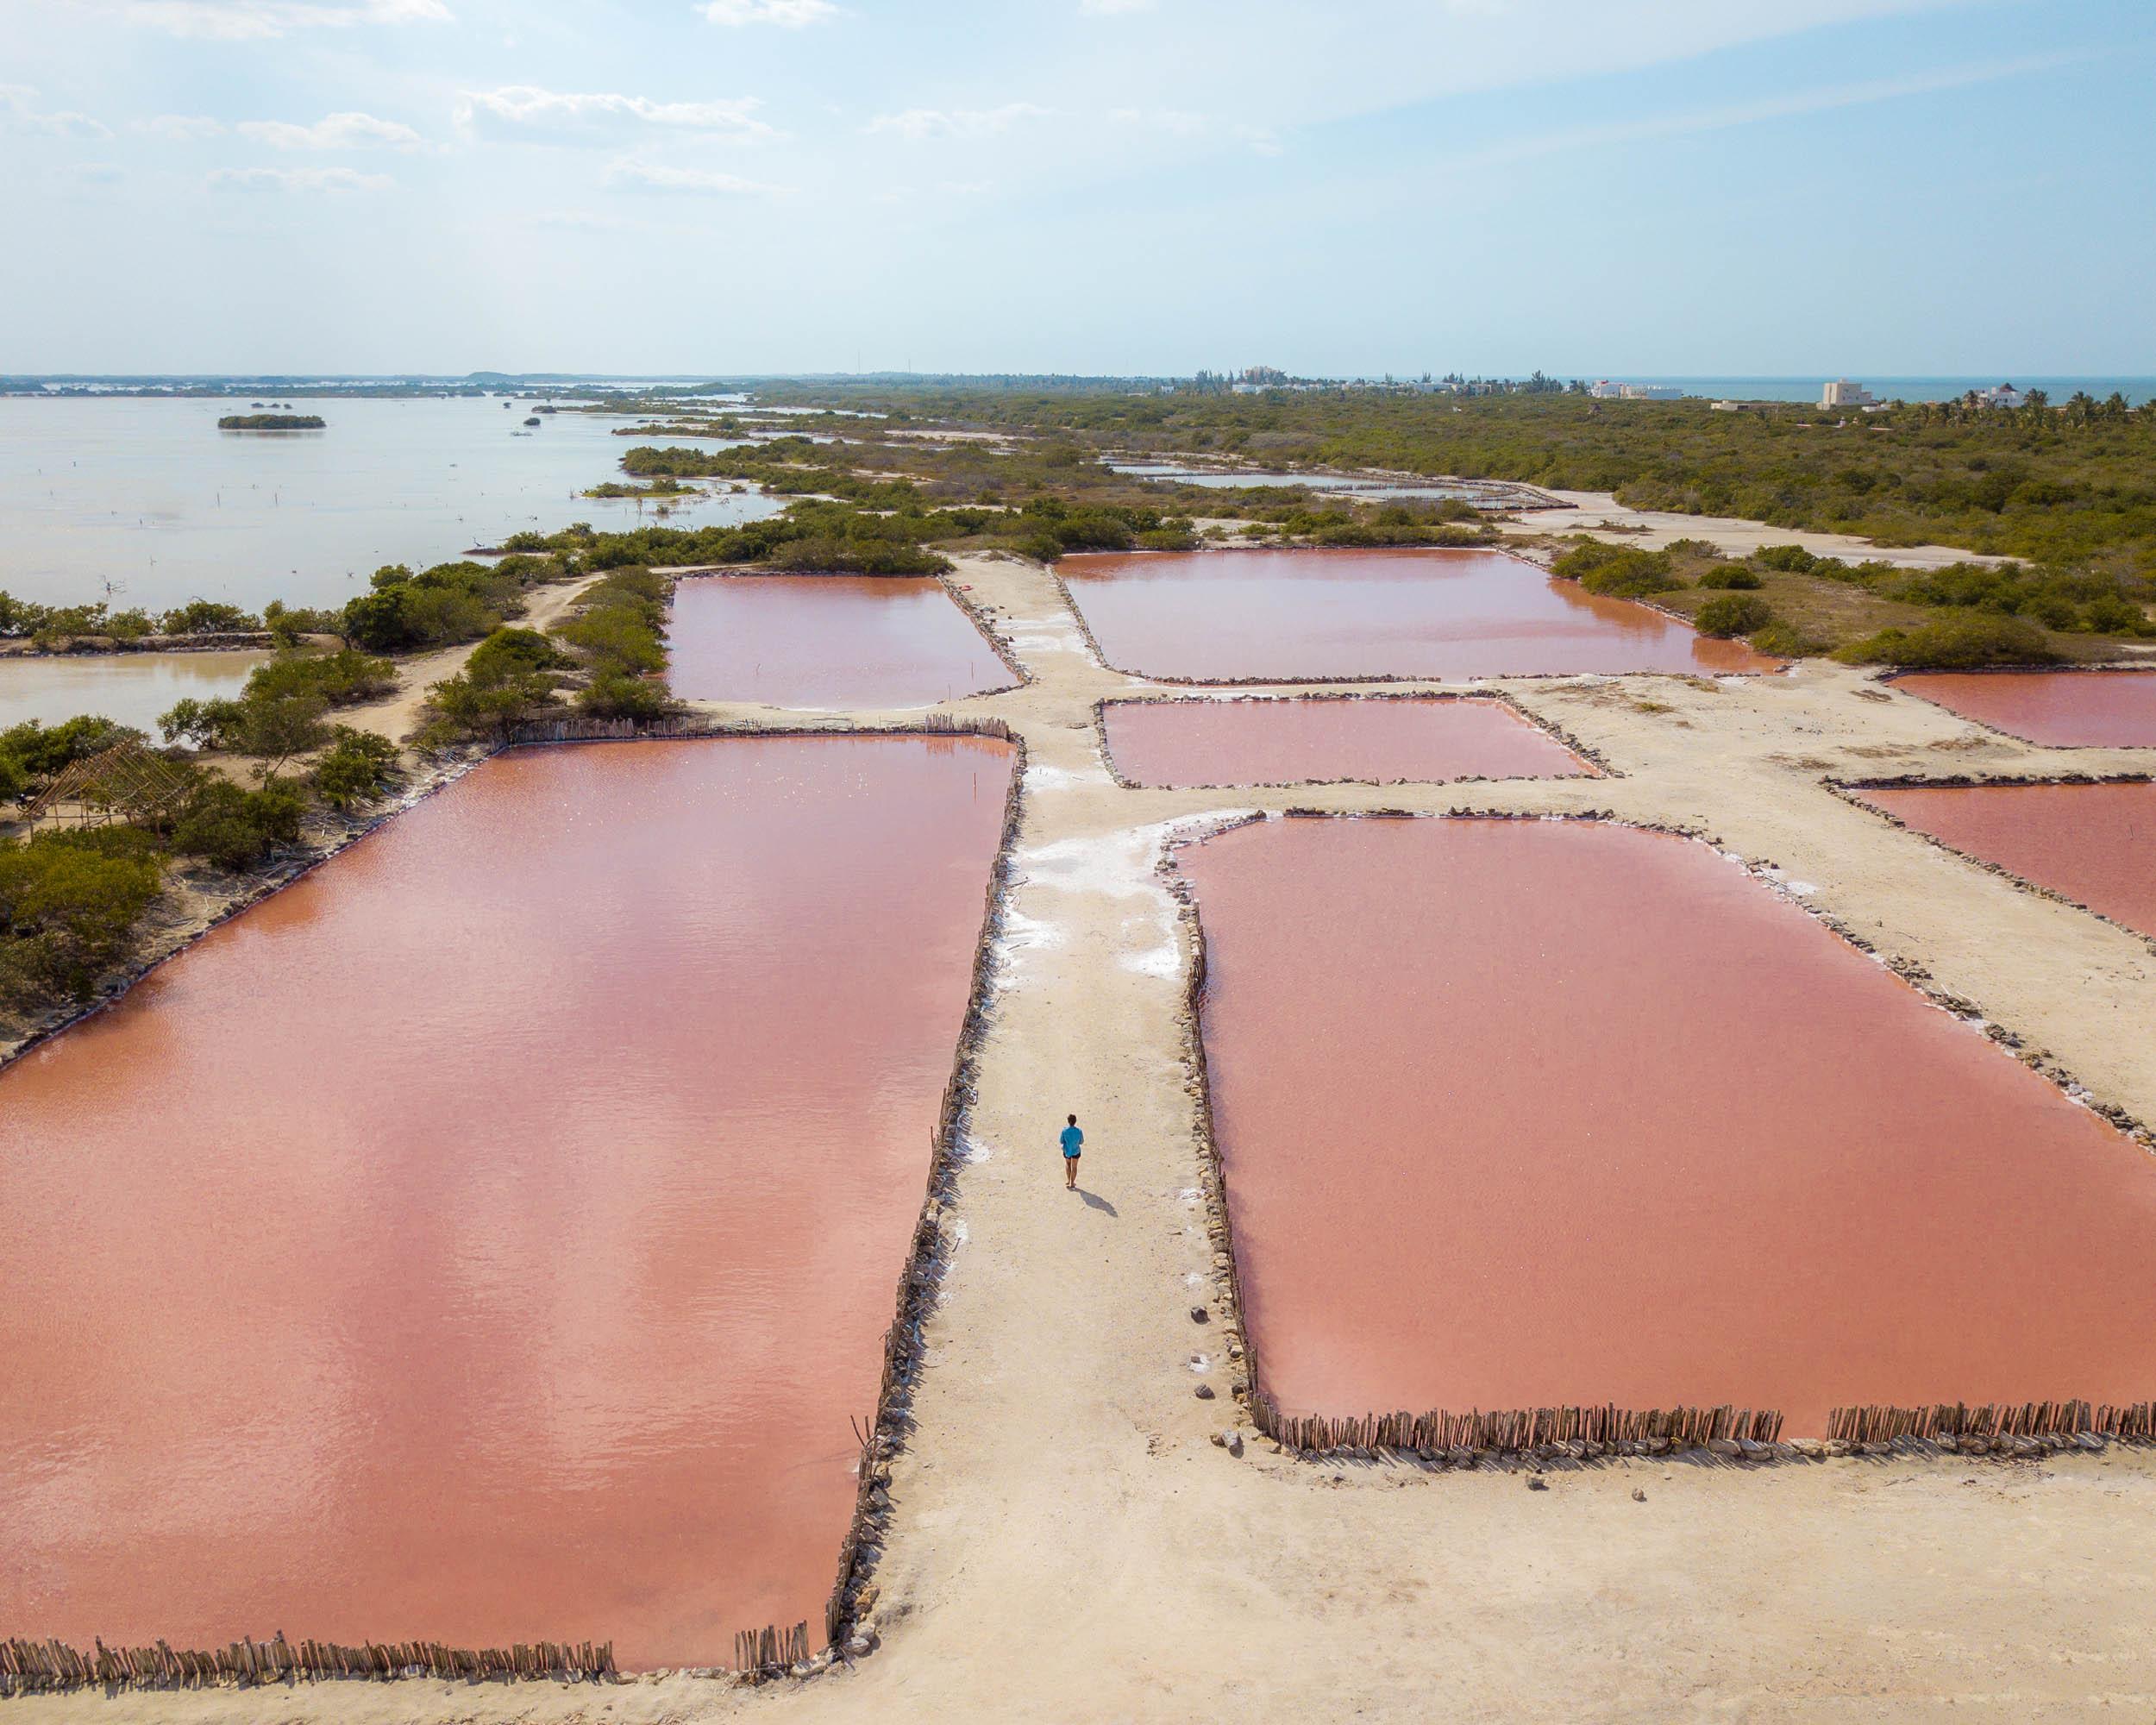 Pink salt flats near Progreso, Mexico